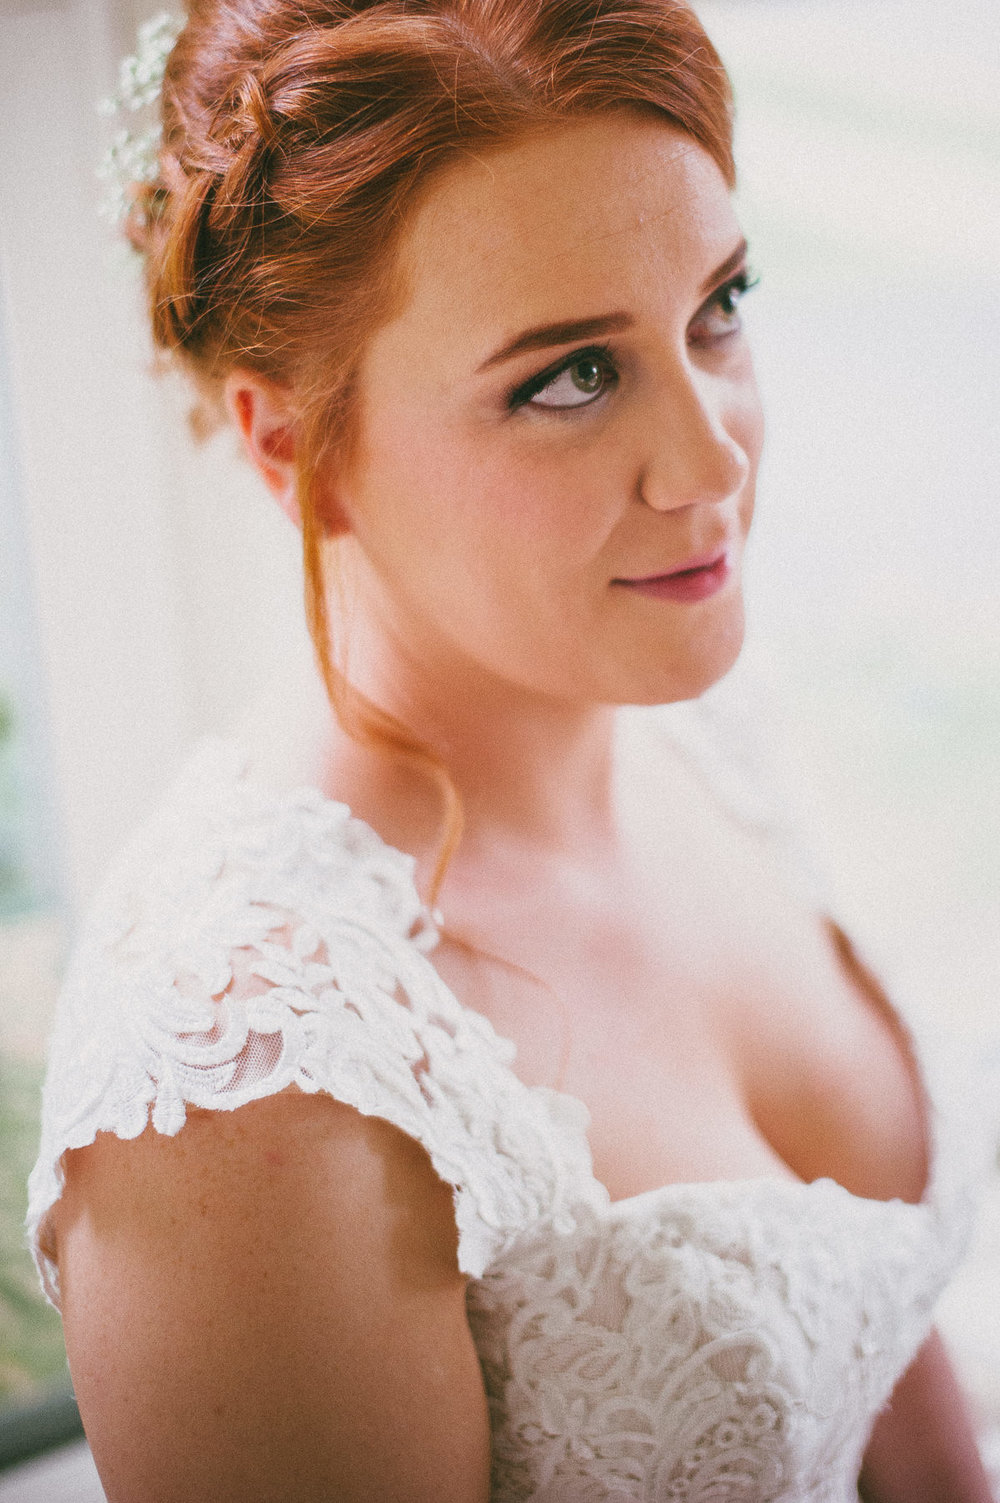 breighton-and-basette-photography-copyrighted-image-blog-amanda-and-eric-wedding-060.jpg